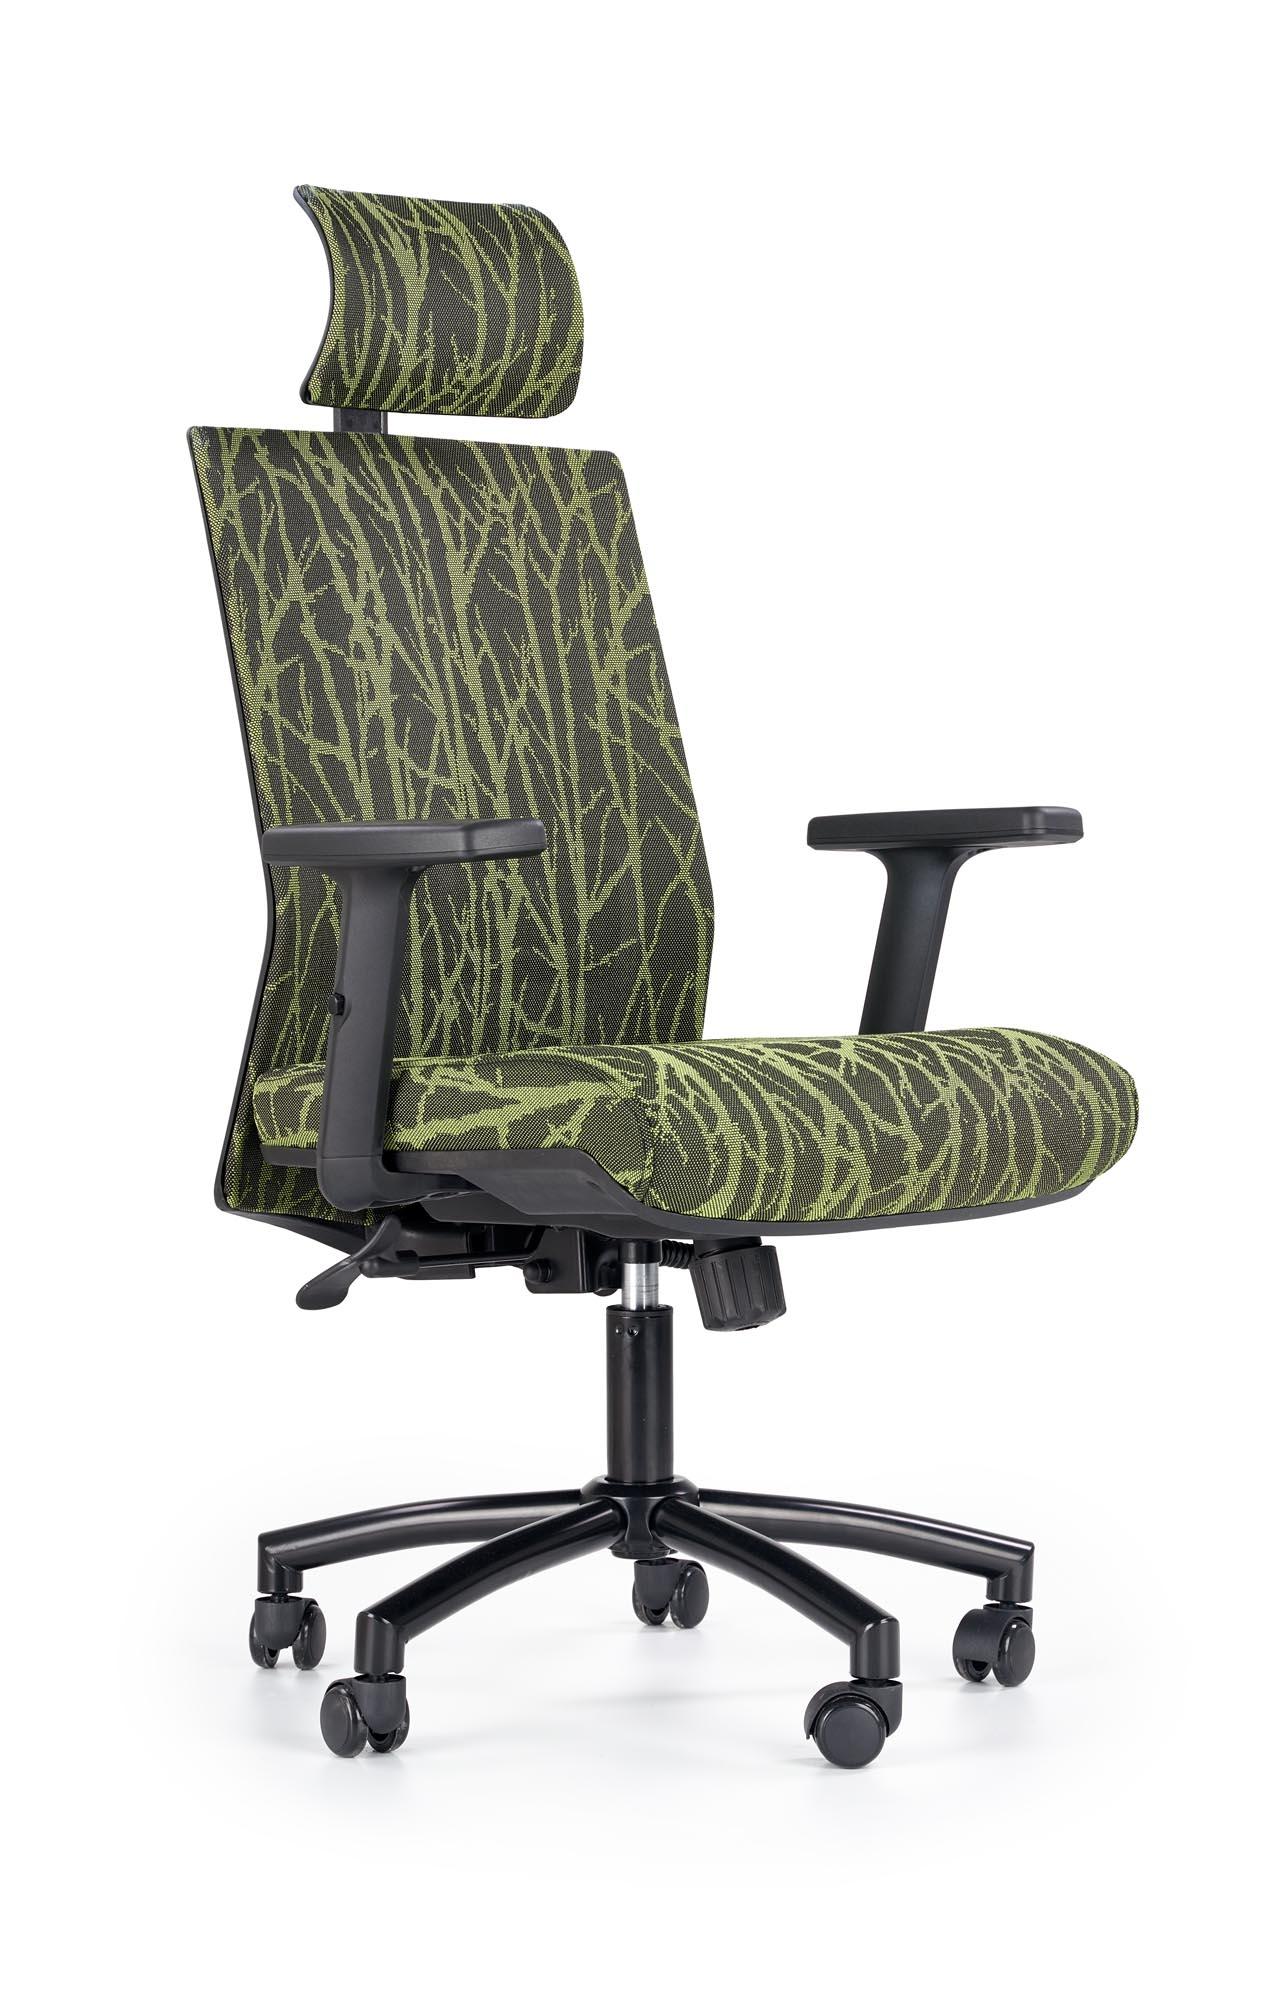 Scaun de birou ergonomic tapitat cu stofa Tropic Black / Green, l64xA59xH115-123 cm